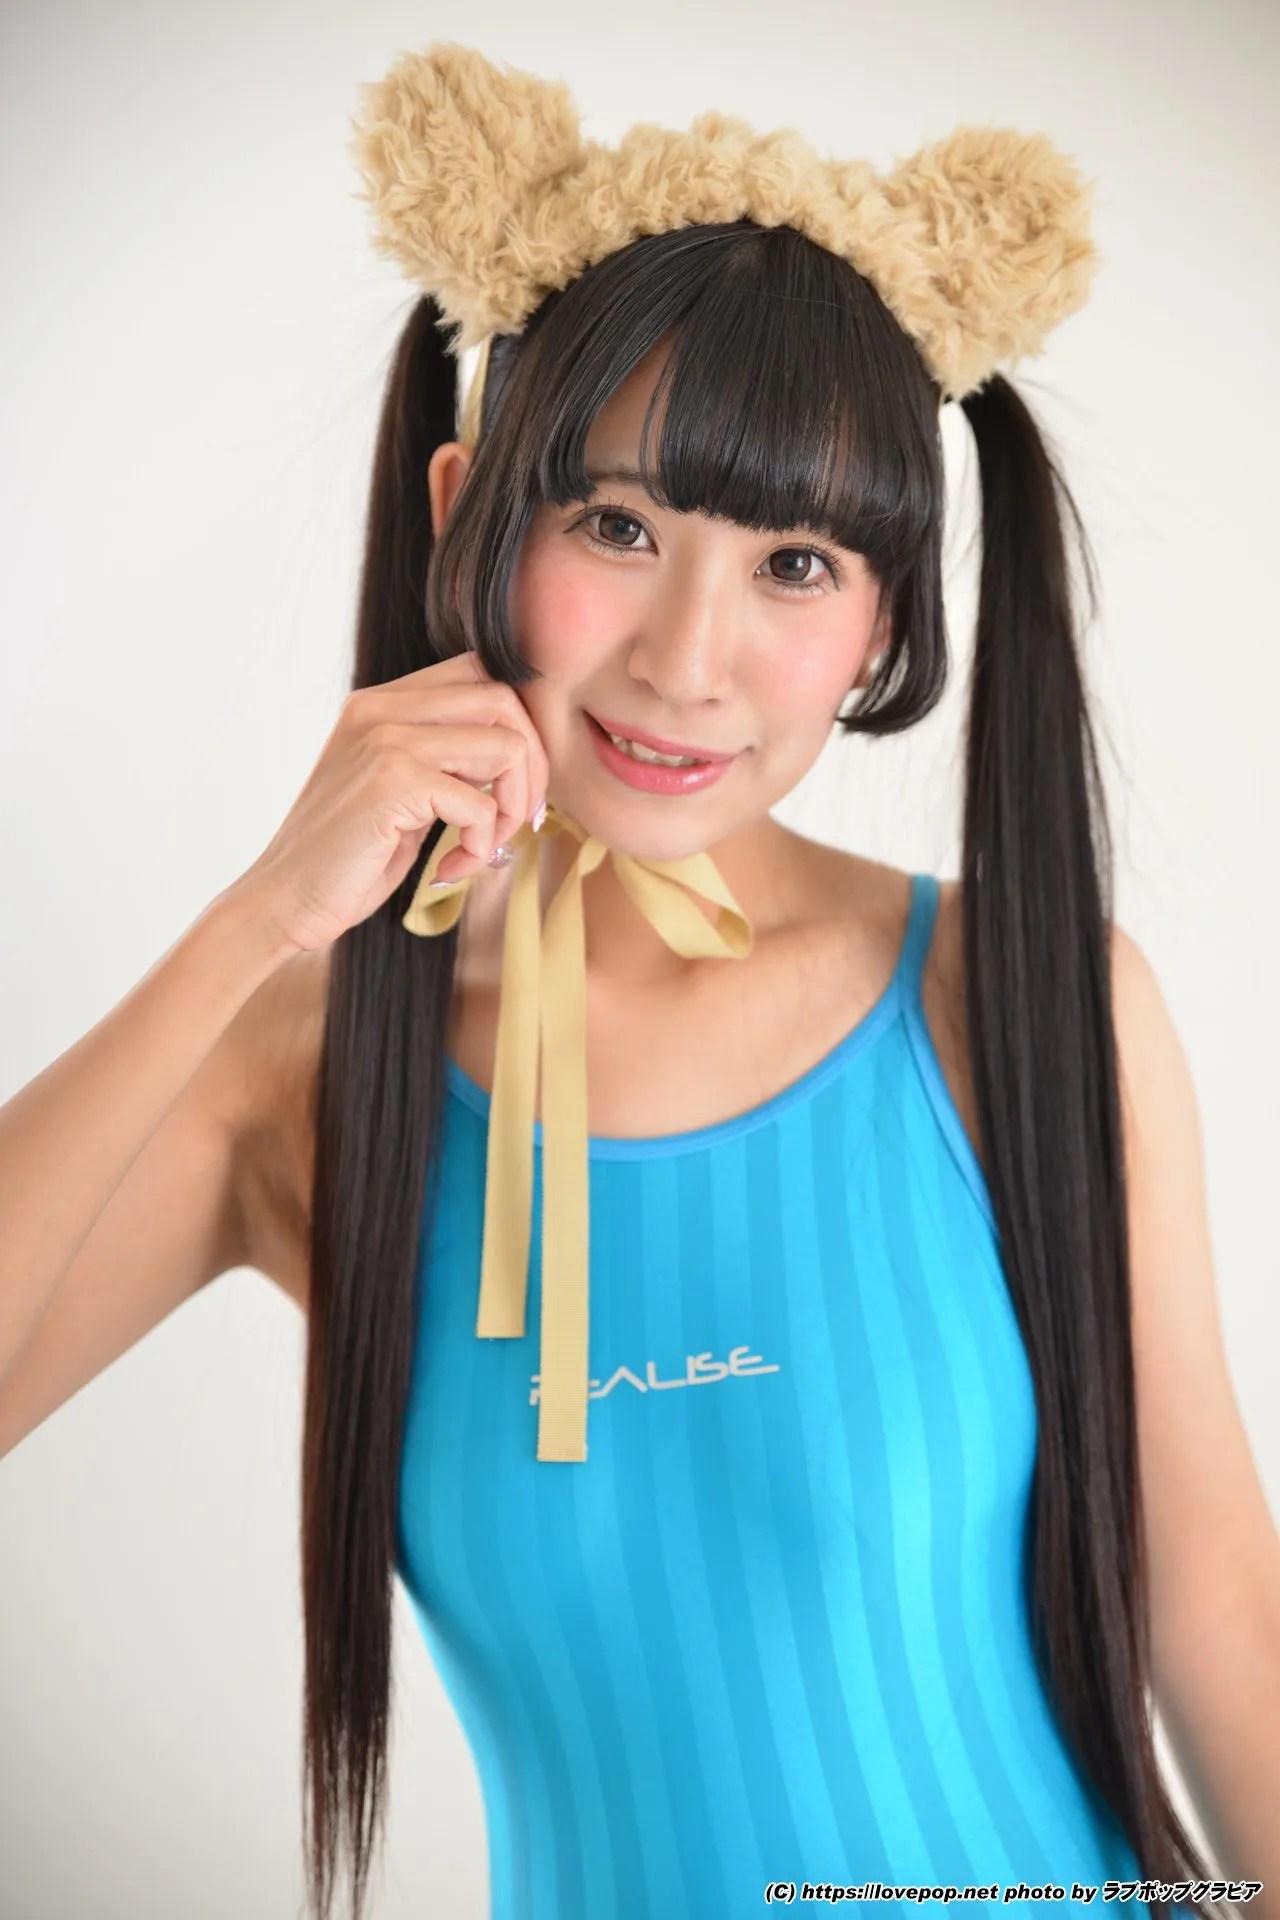 [LOVEPOP] 五十岚もか Moka Igarashi Photoset 11 写真集[50P]插图(2)